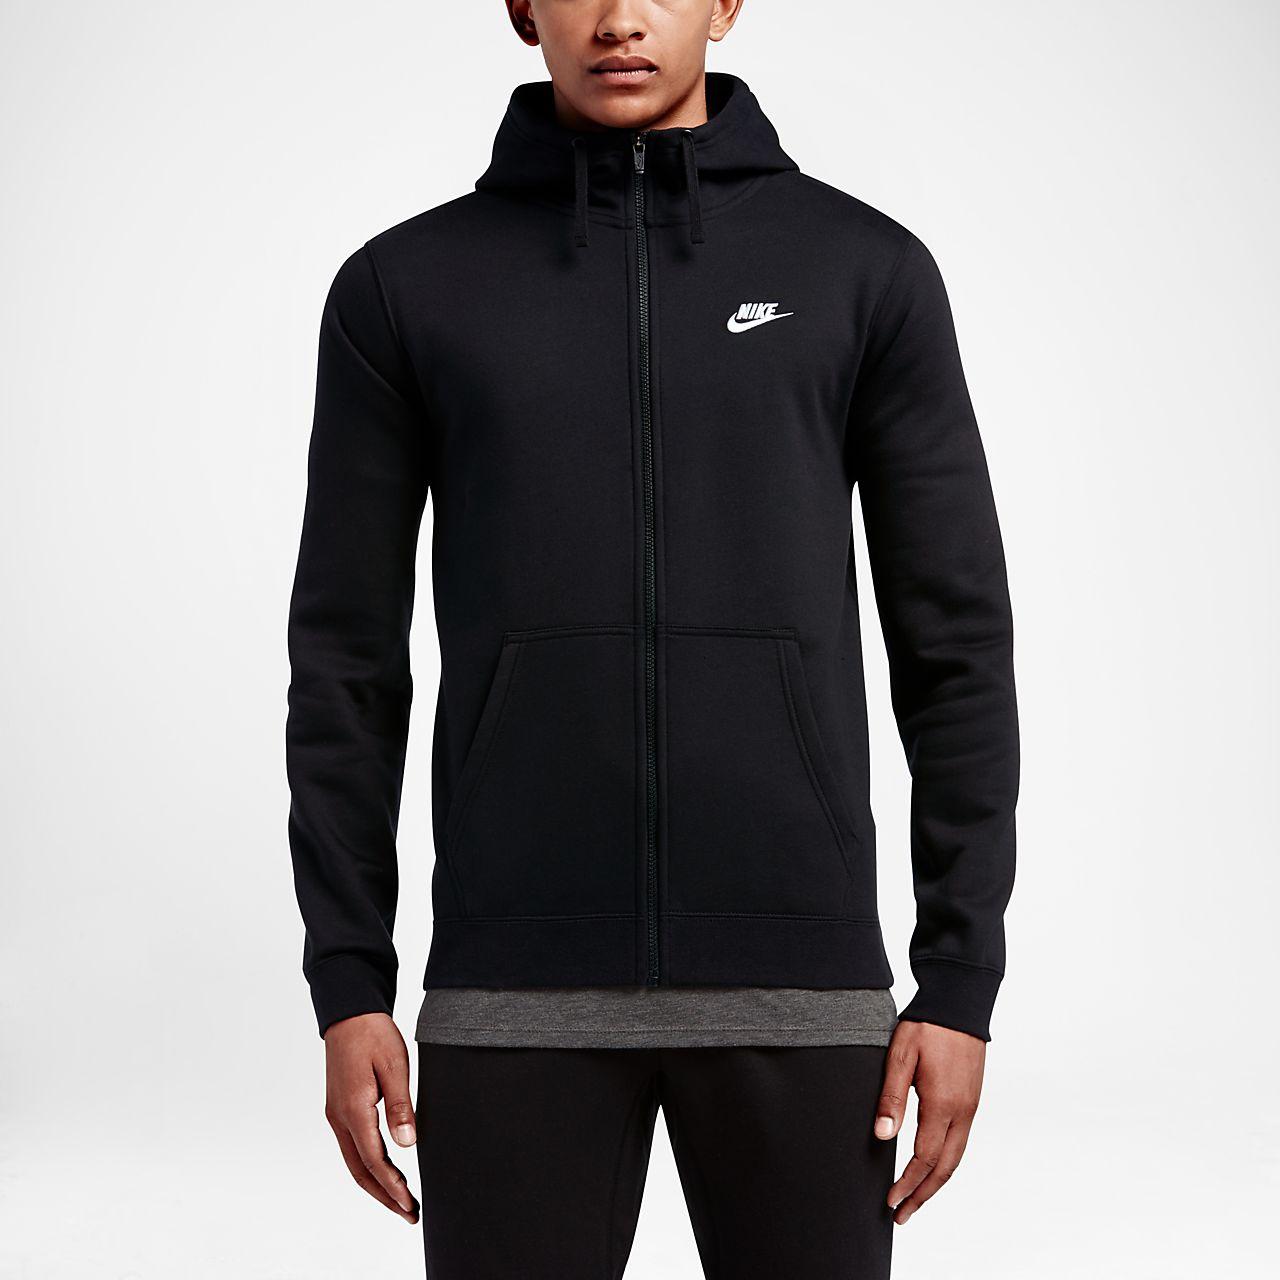 ... Sudadera con capucha para hombre Nike Sportswear Full-Zip